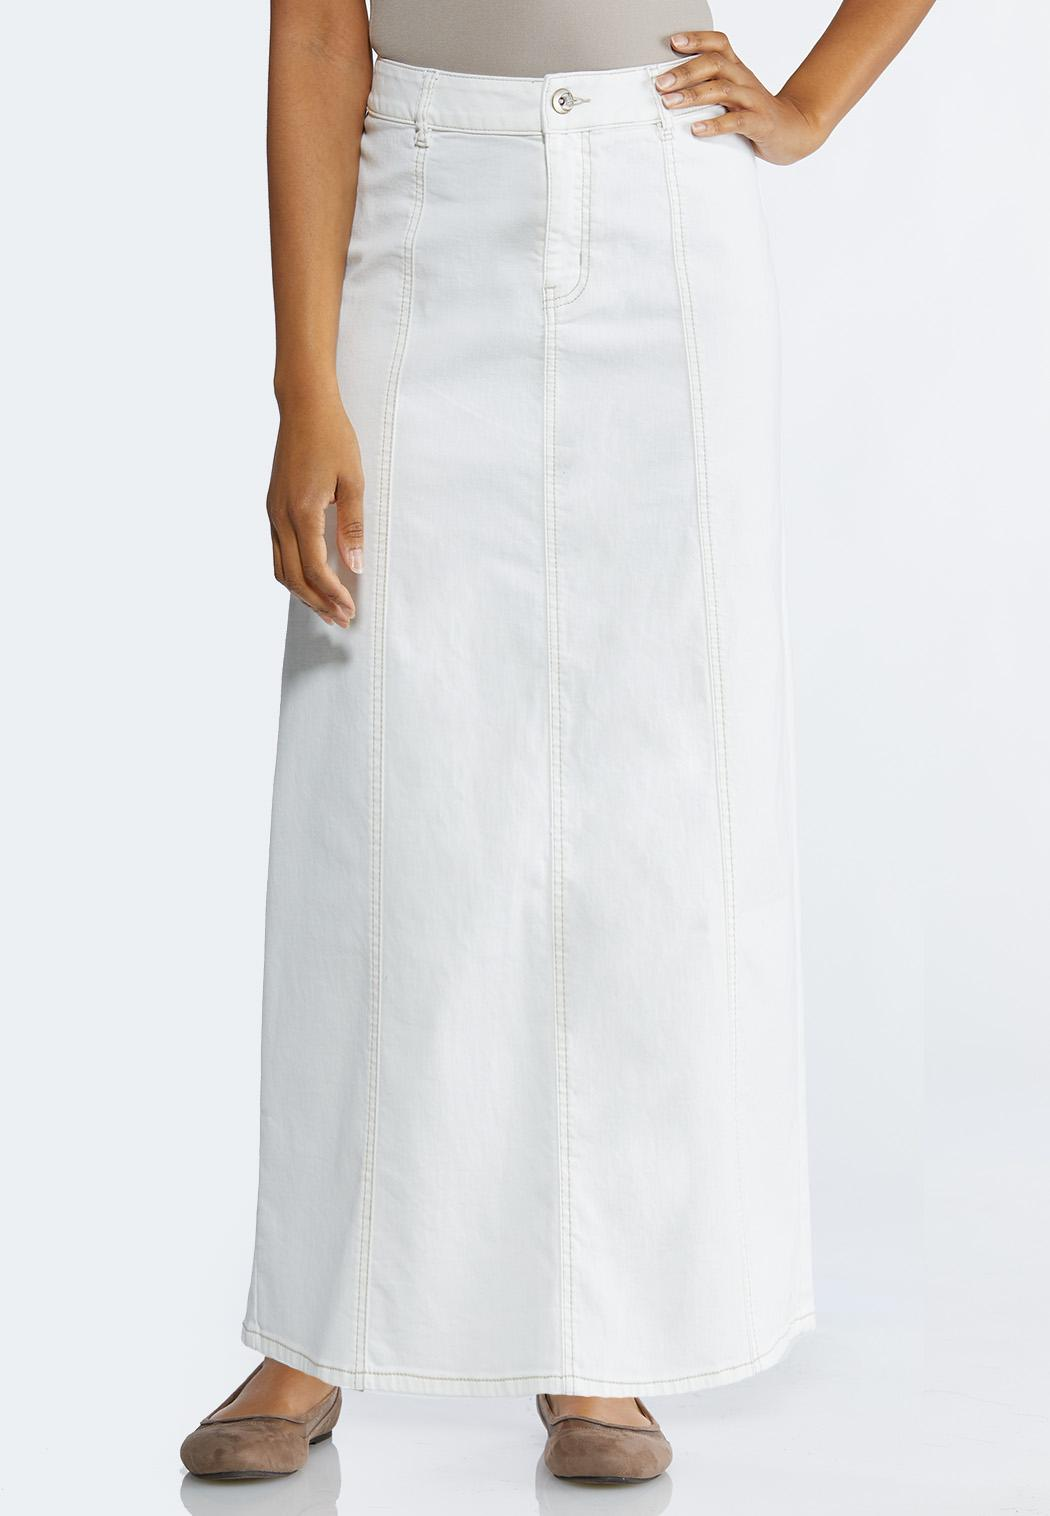 9e9f63b35 White Denim Skirts Plus Size | Huston Fislar Photography